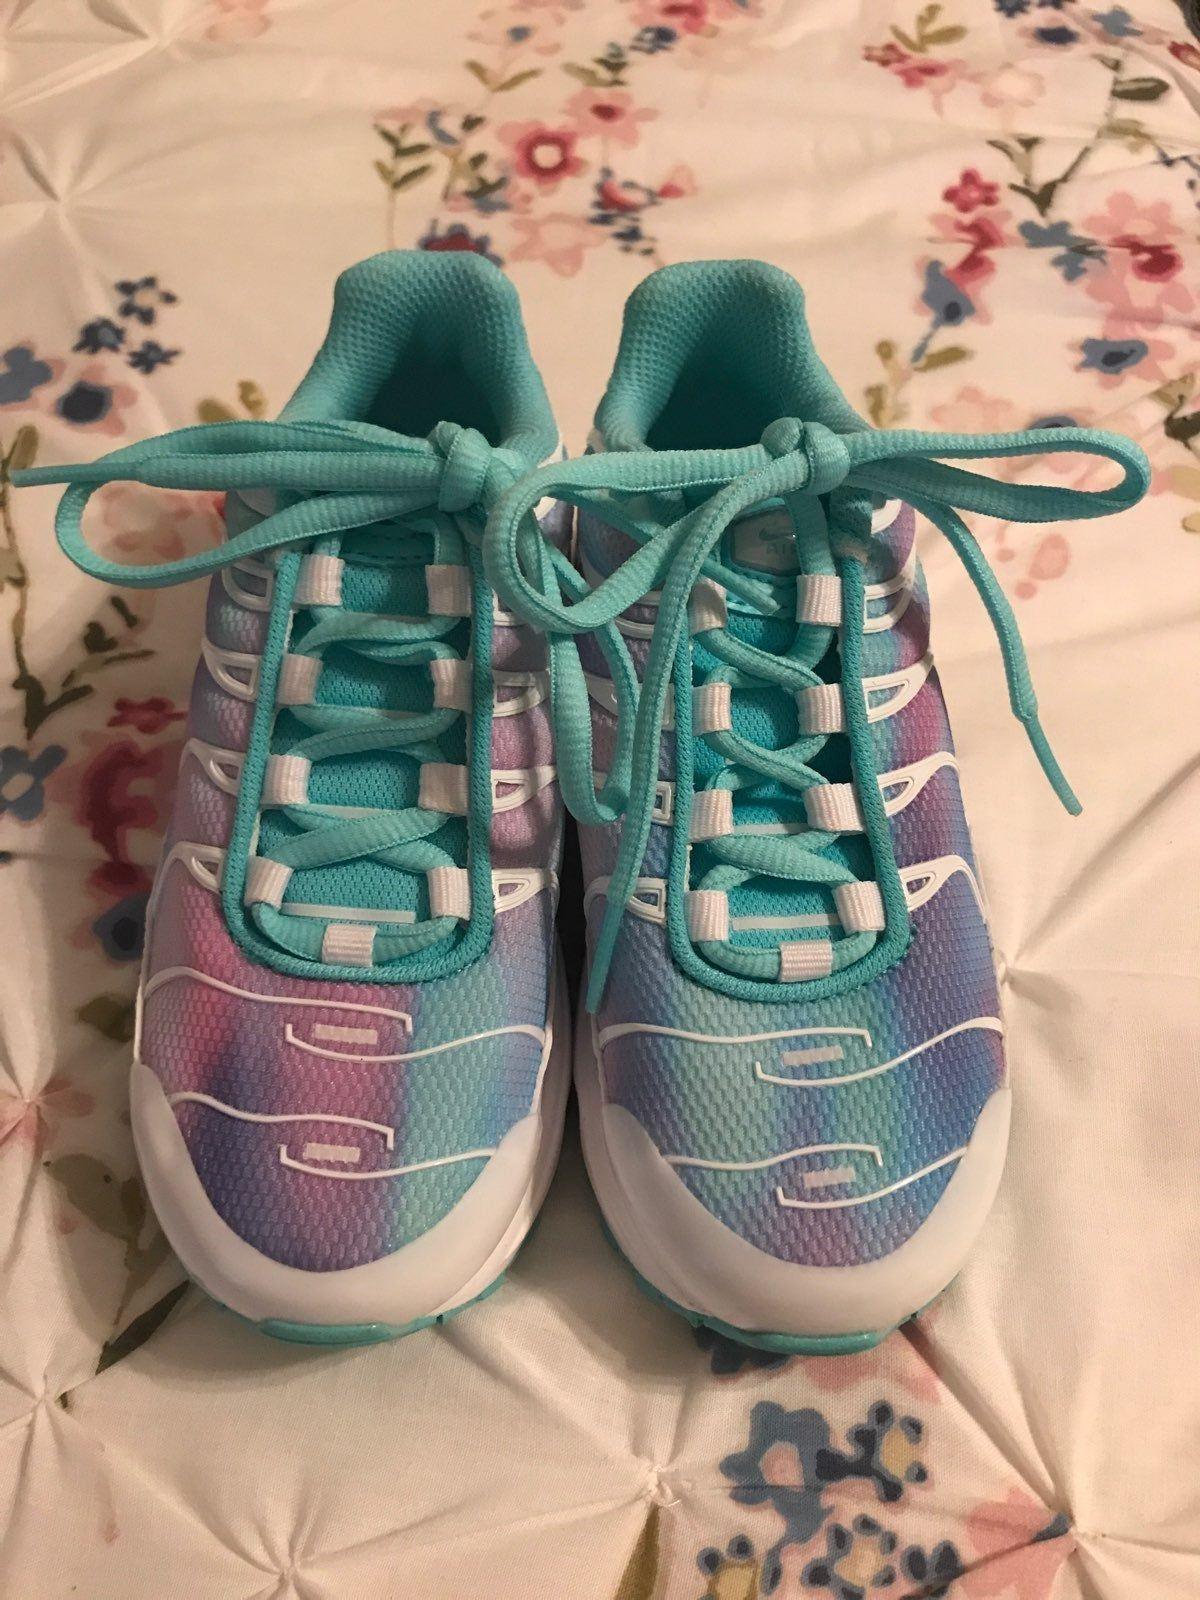 box girls Nike Air Max Plus turquoise